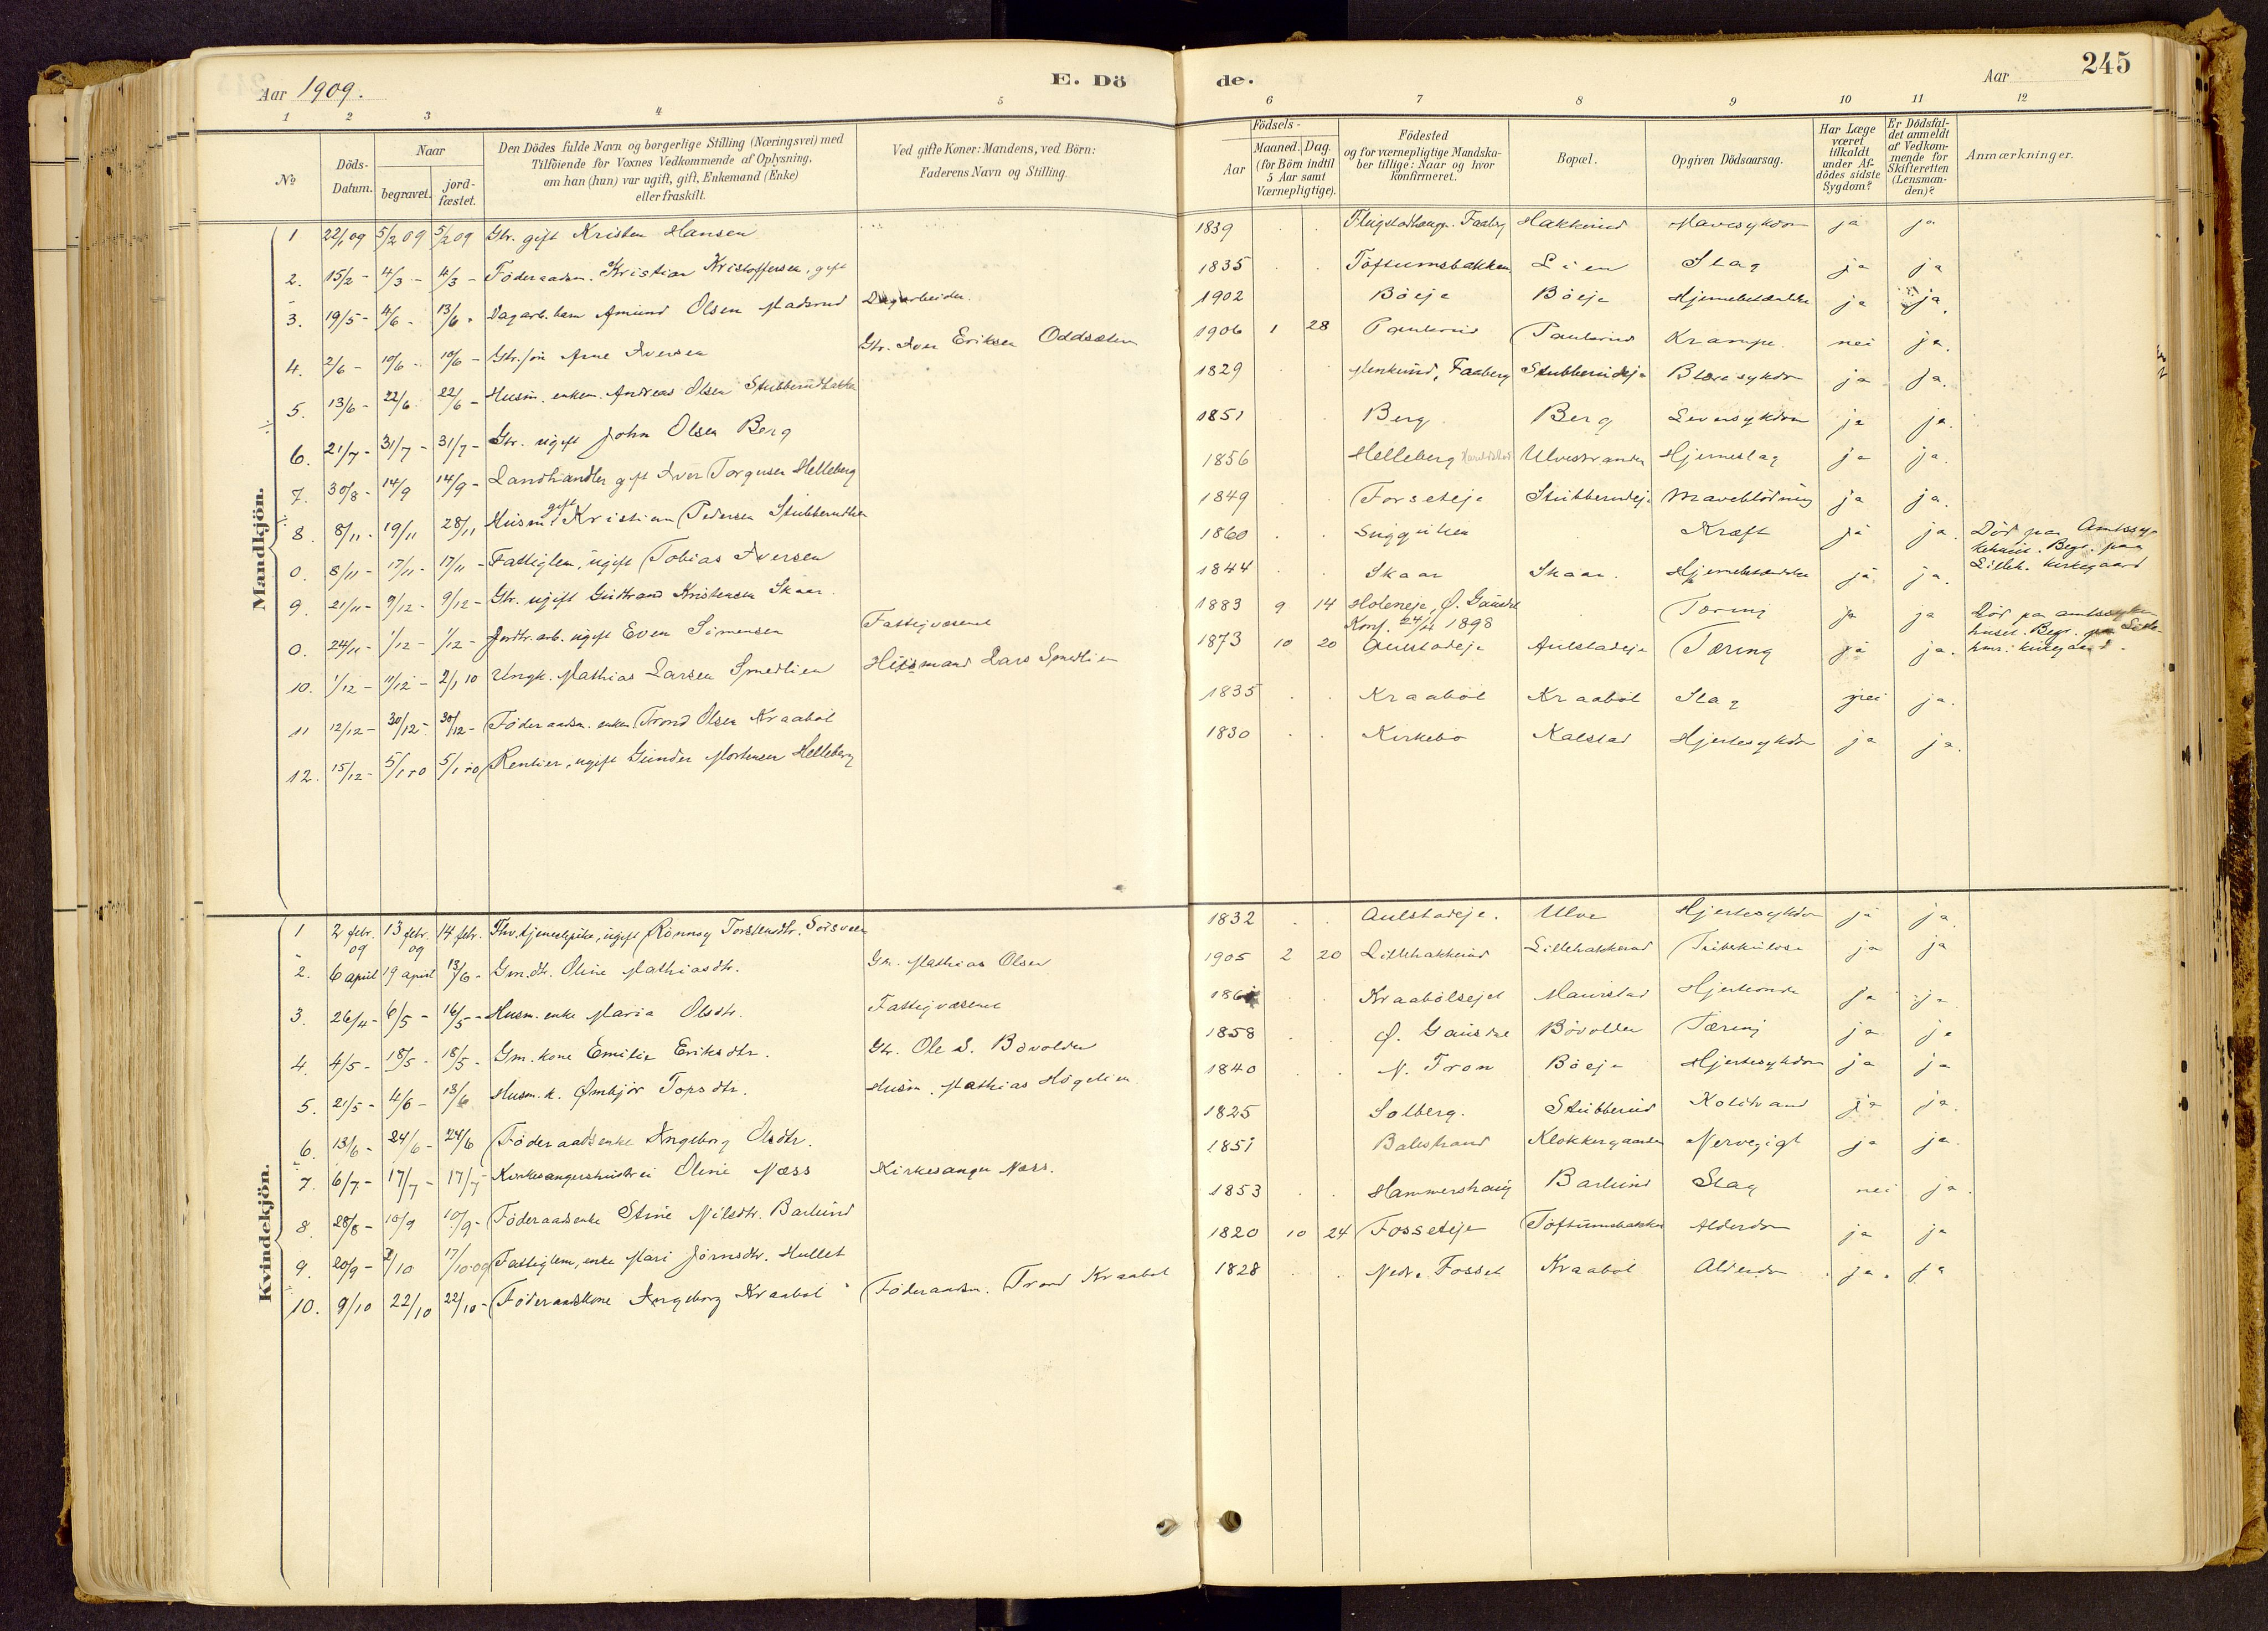 SAH, Vestre Gausdal prestekontor, Ministerialbok nr. 1, 1887-1914, s. 245